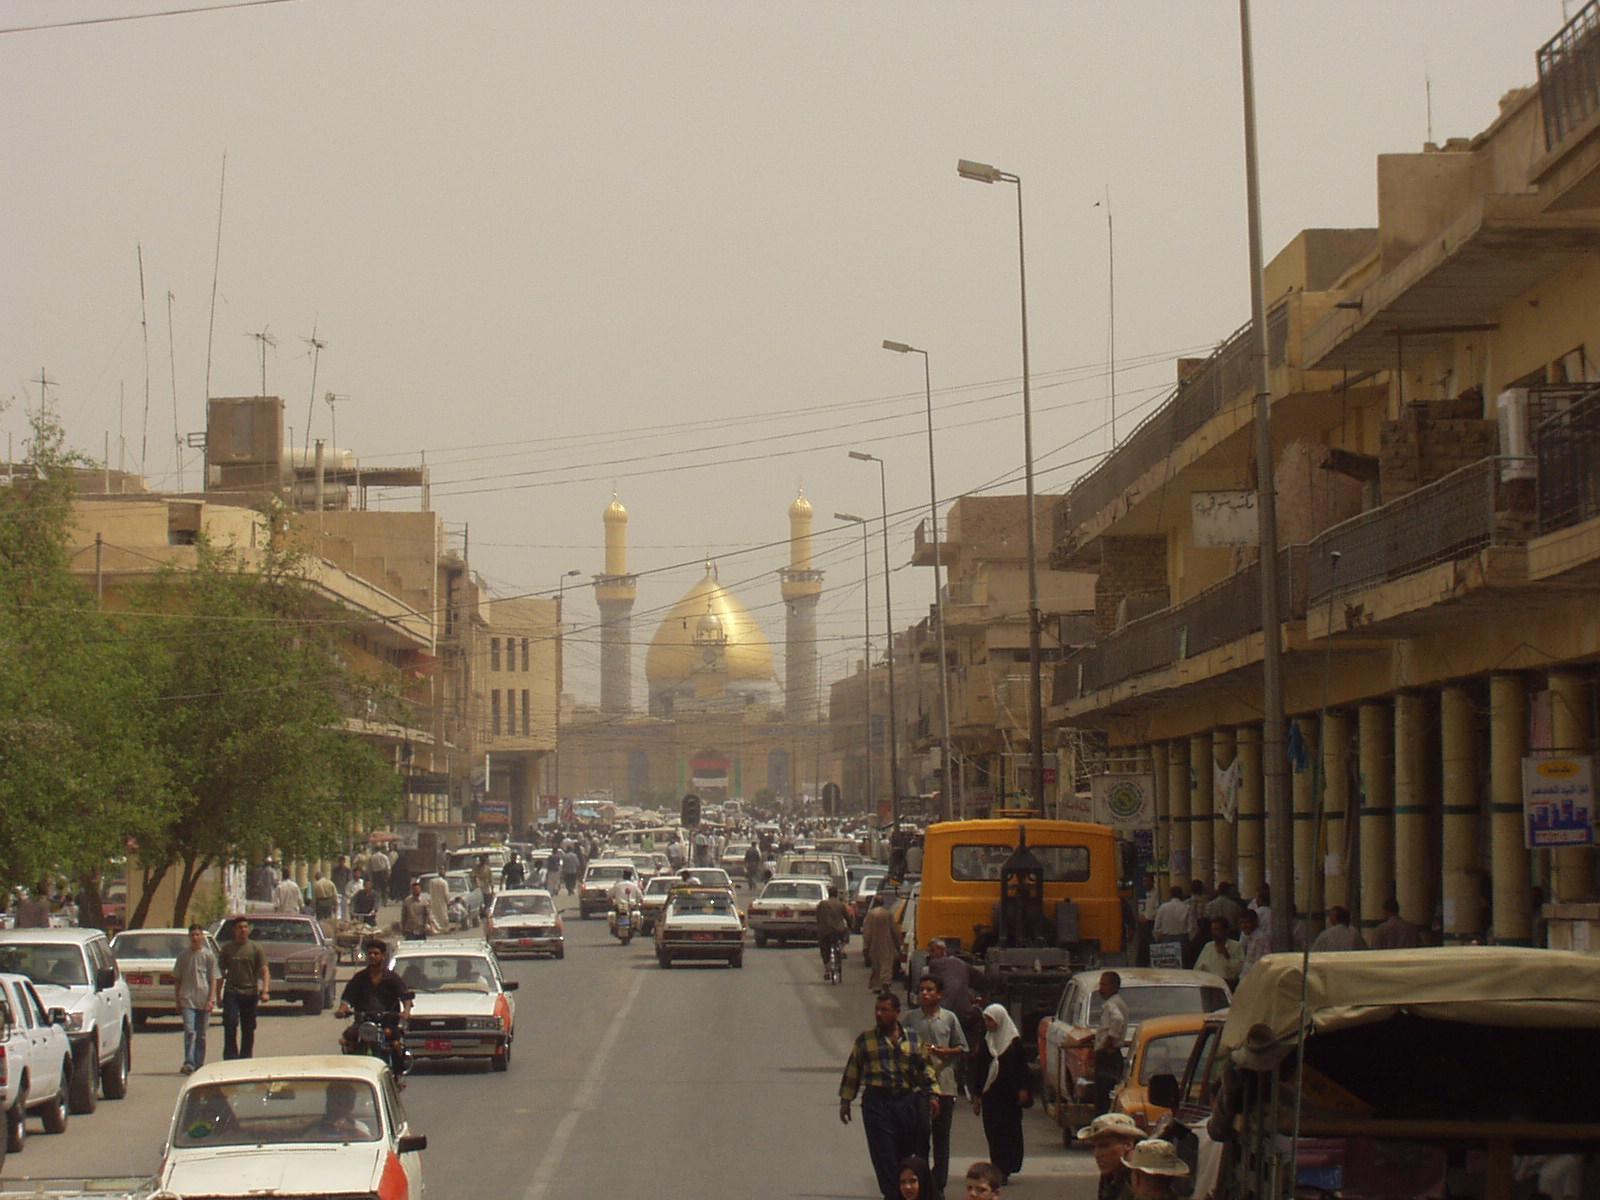 http://2.bp.blogspot.com/_e45GK4i1E8M/TRdwSu1bsFI/AAAAAAAACic/MhkaJWMYI54/s1600/Iraq-Karbala.jpg